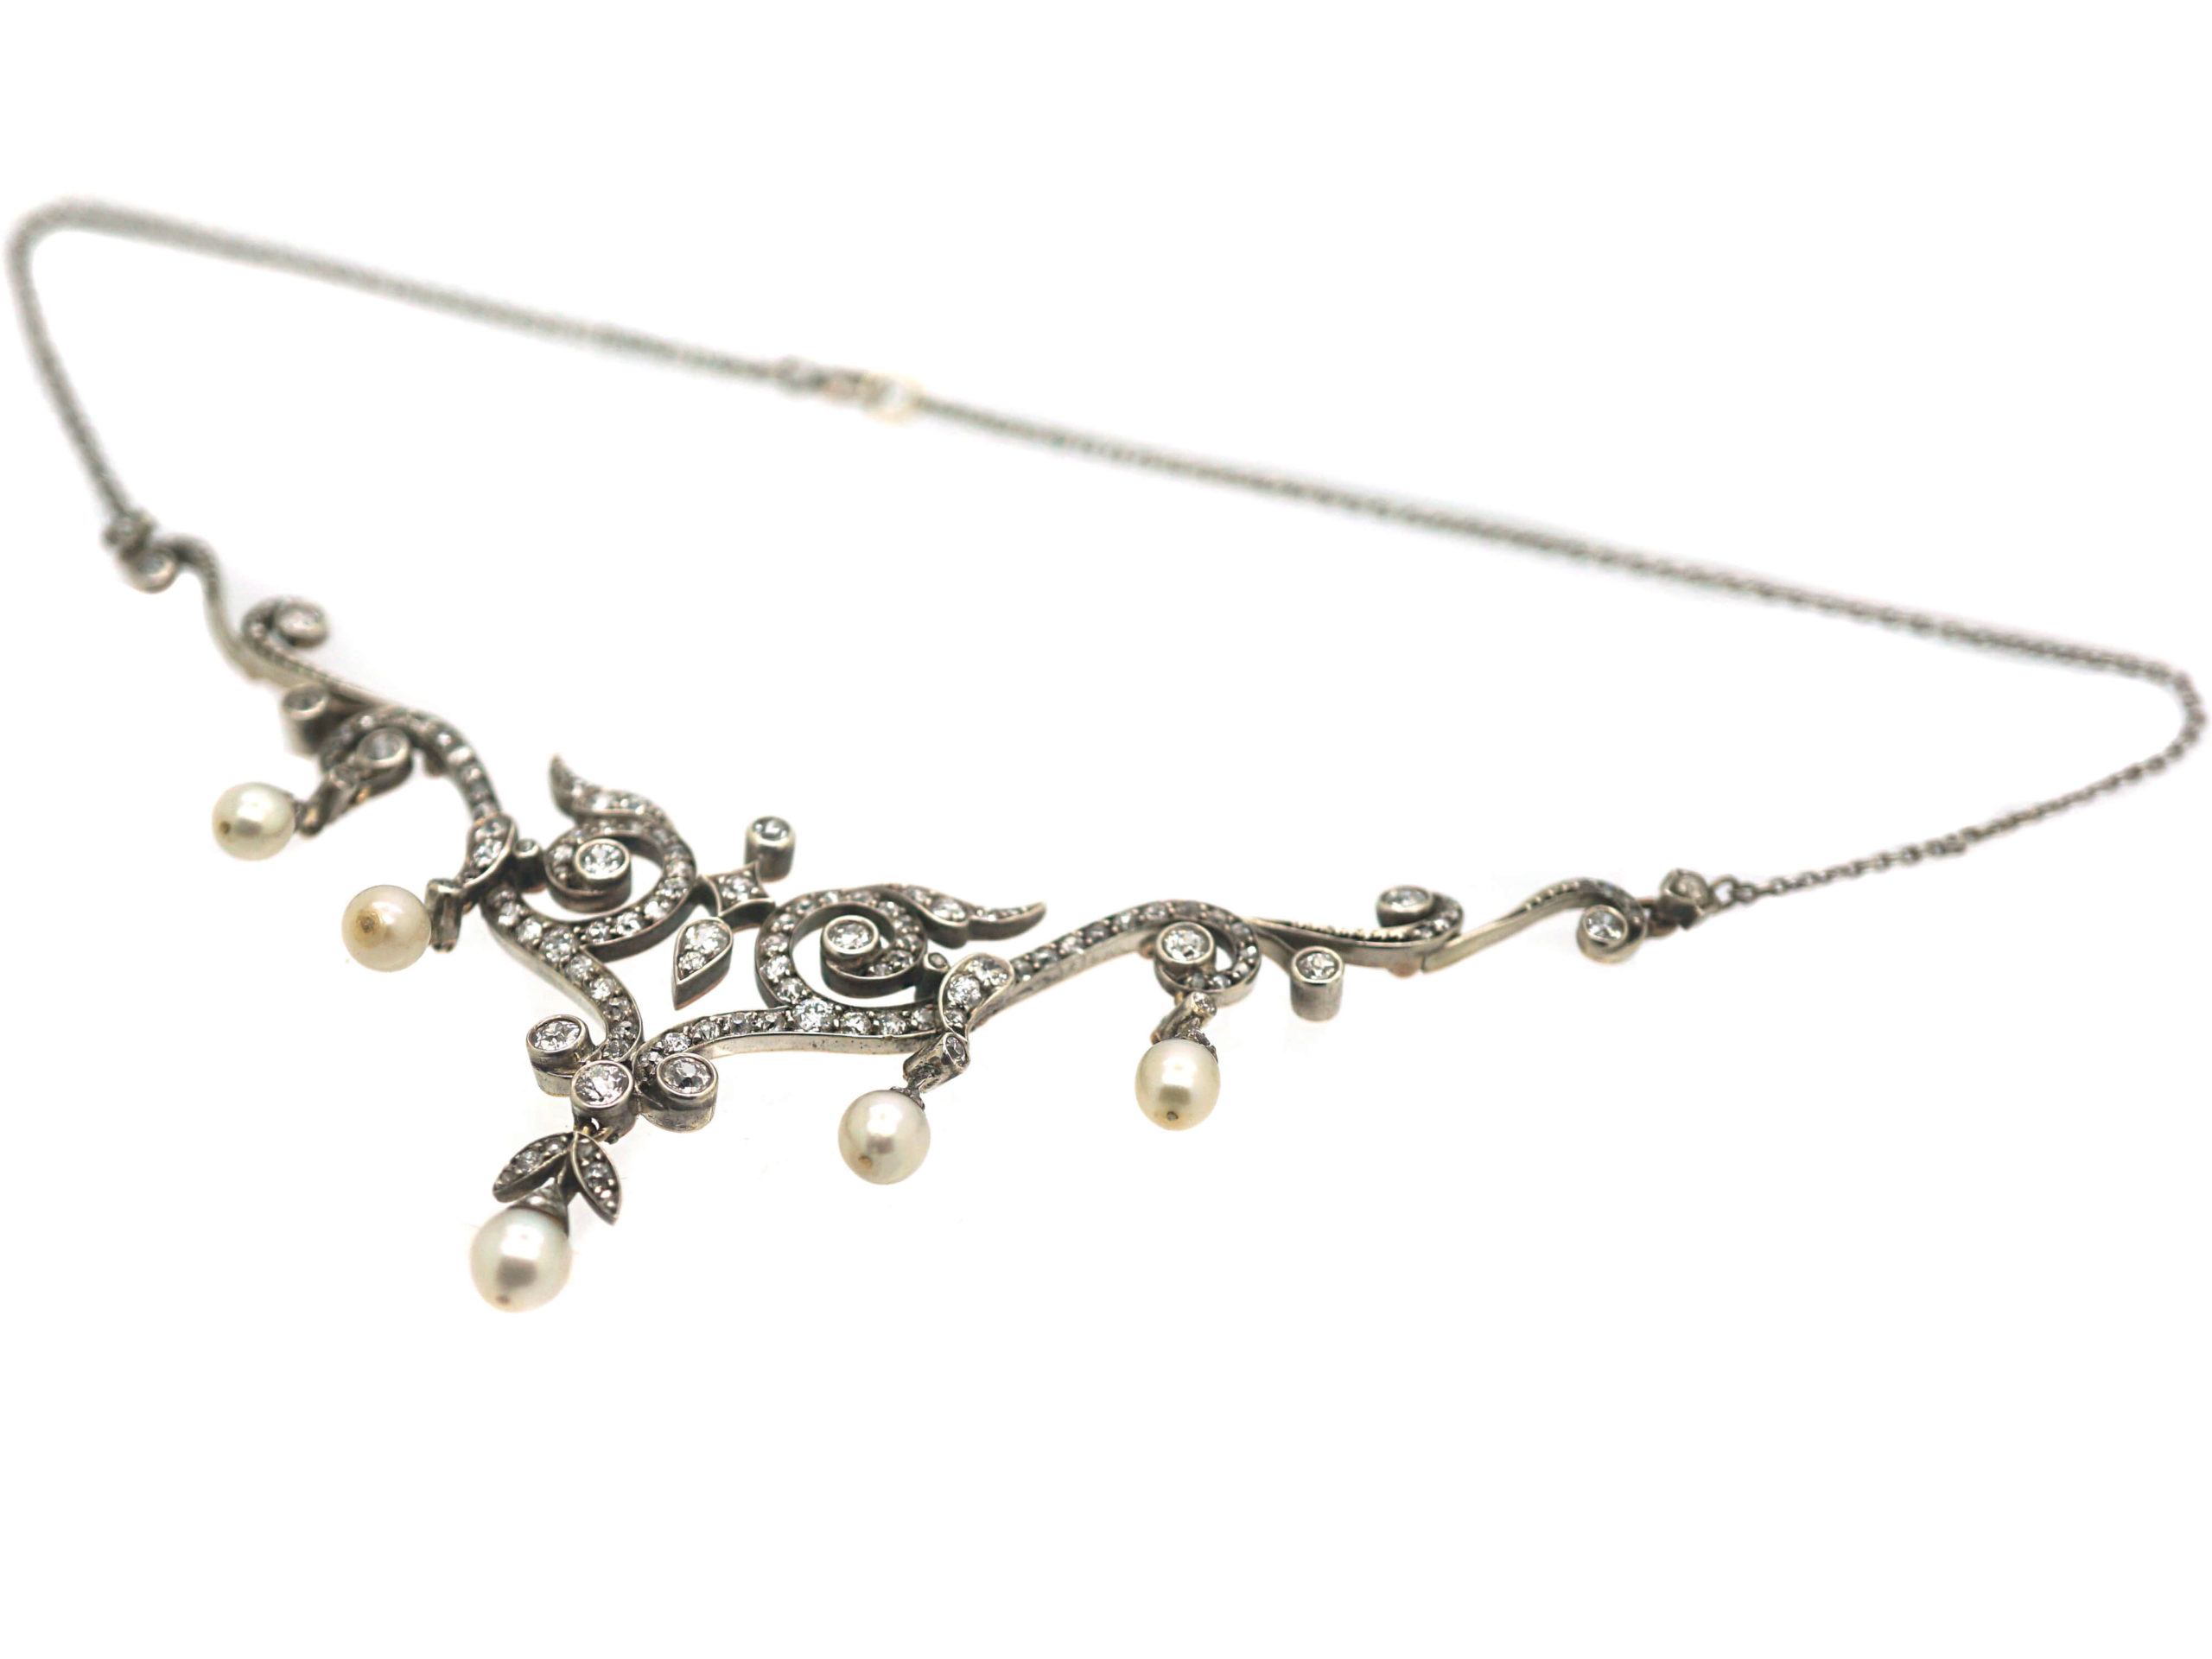 Edwardian 15ct Gold & Platinum, Natural Pearl & Diamond Necklace in Original Case